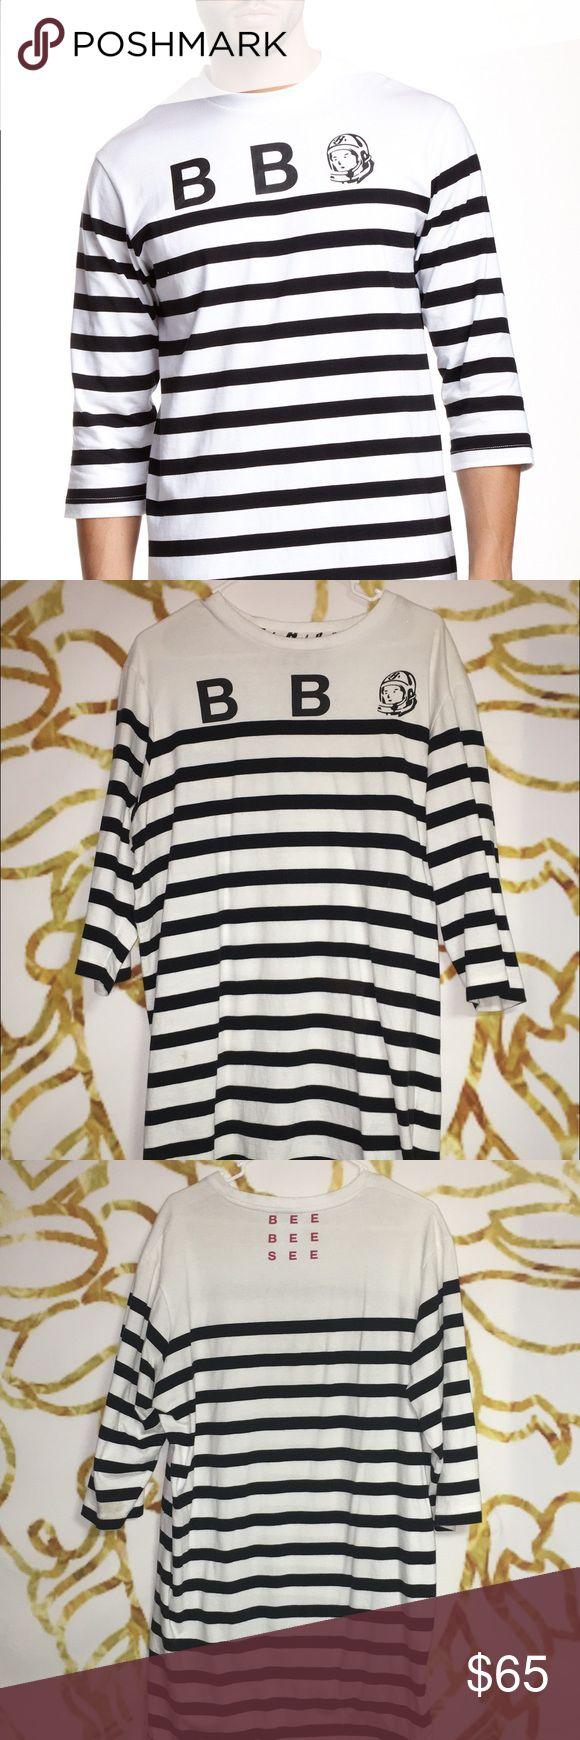 Billionaire Boys Club Stripe Tunic Billionaire Boys Club tee in great shape. Size XL. Billionaire Boys Club Shirts Tees - Long Sleeve